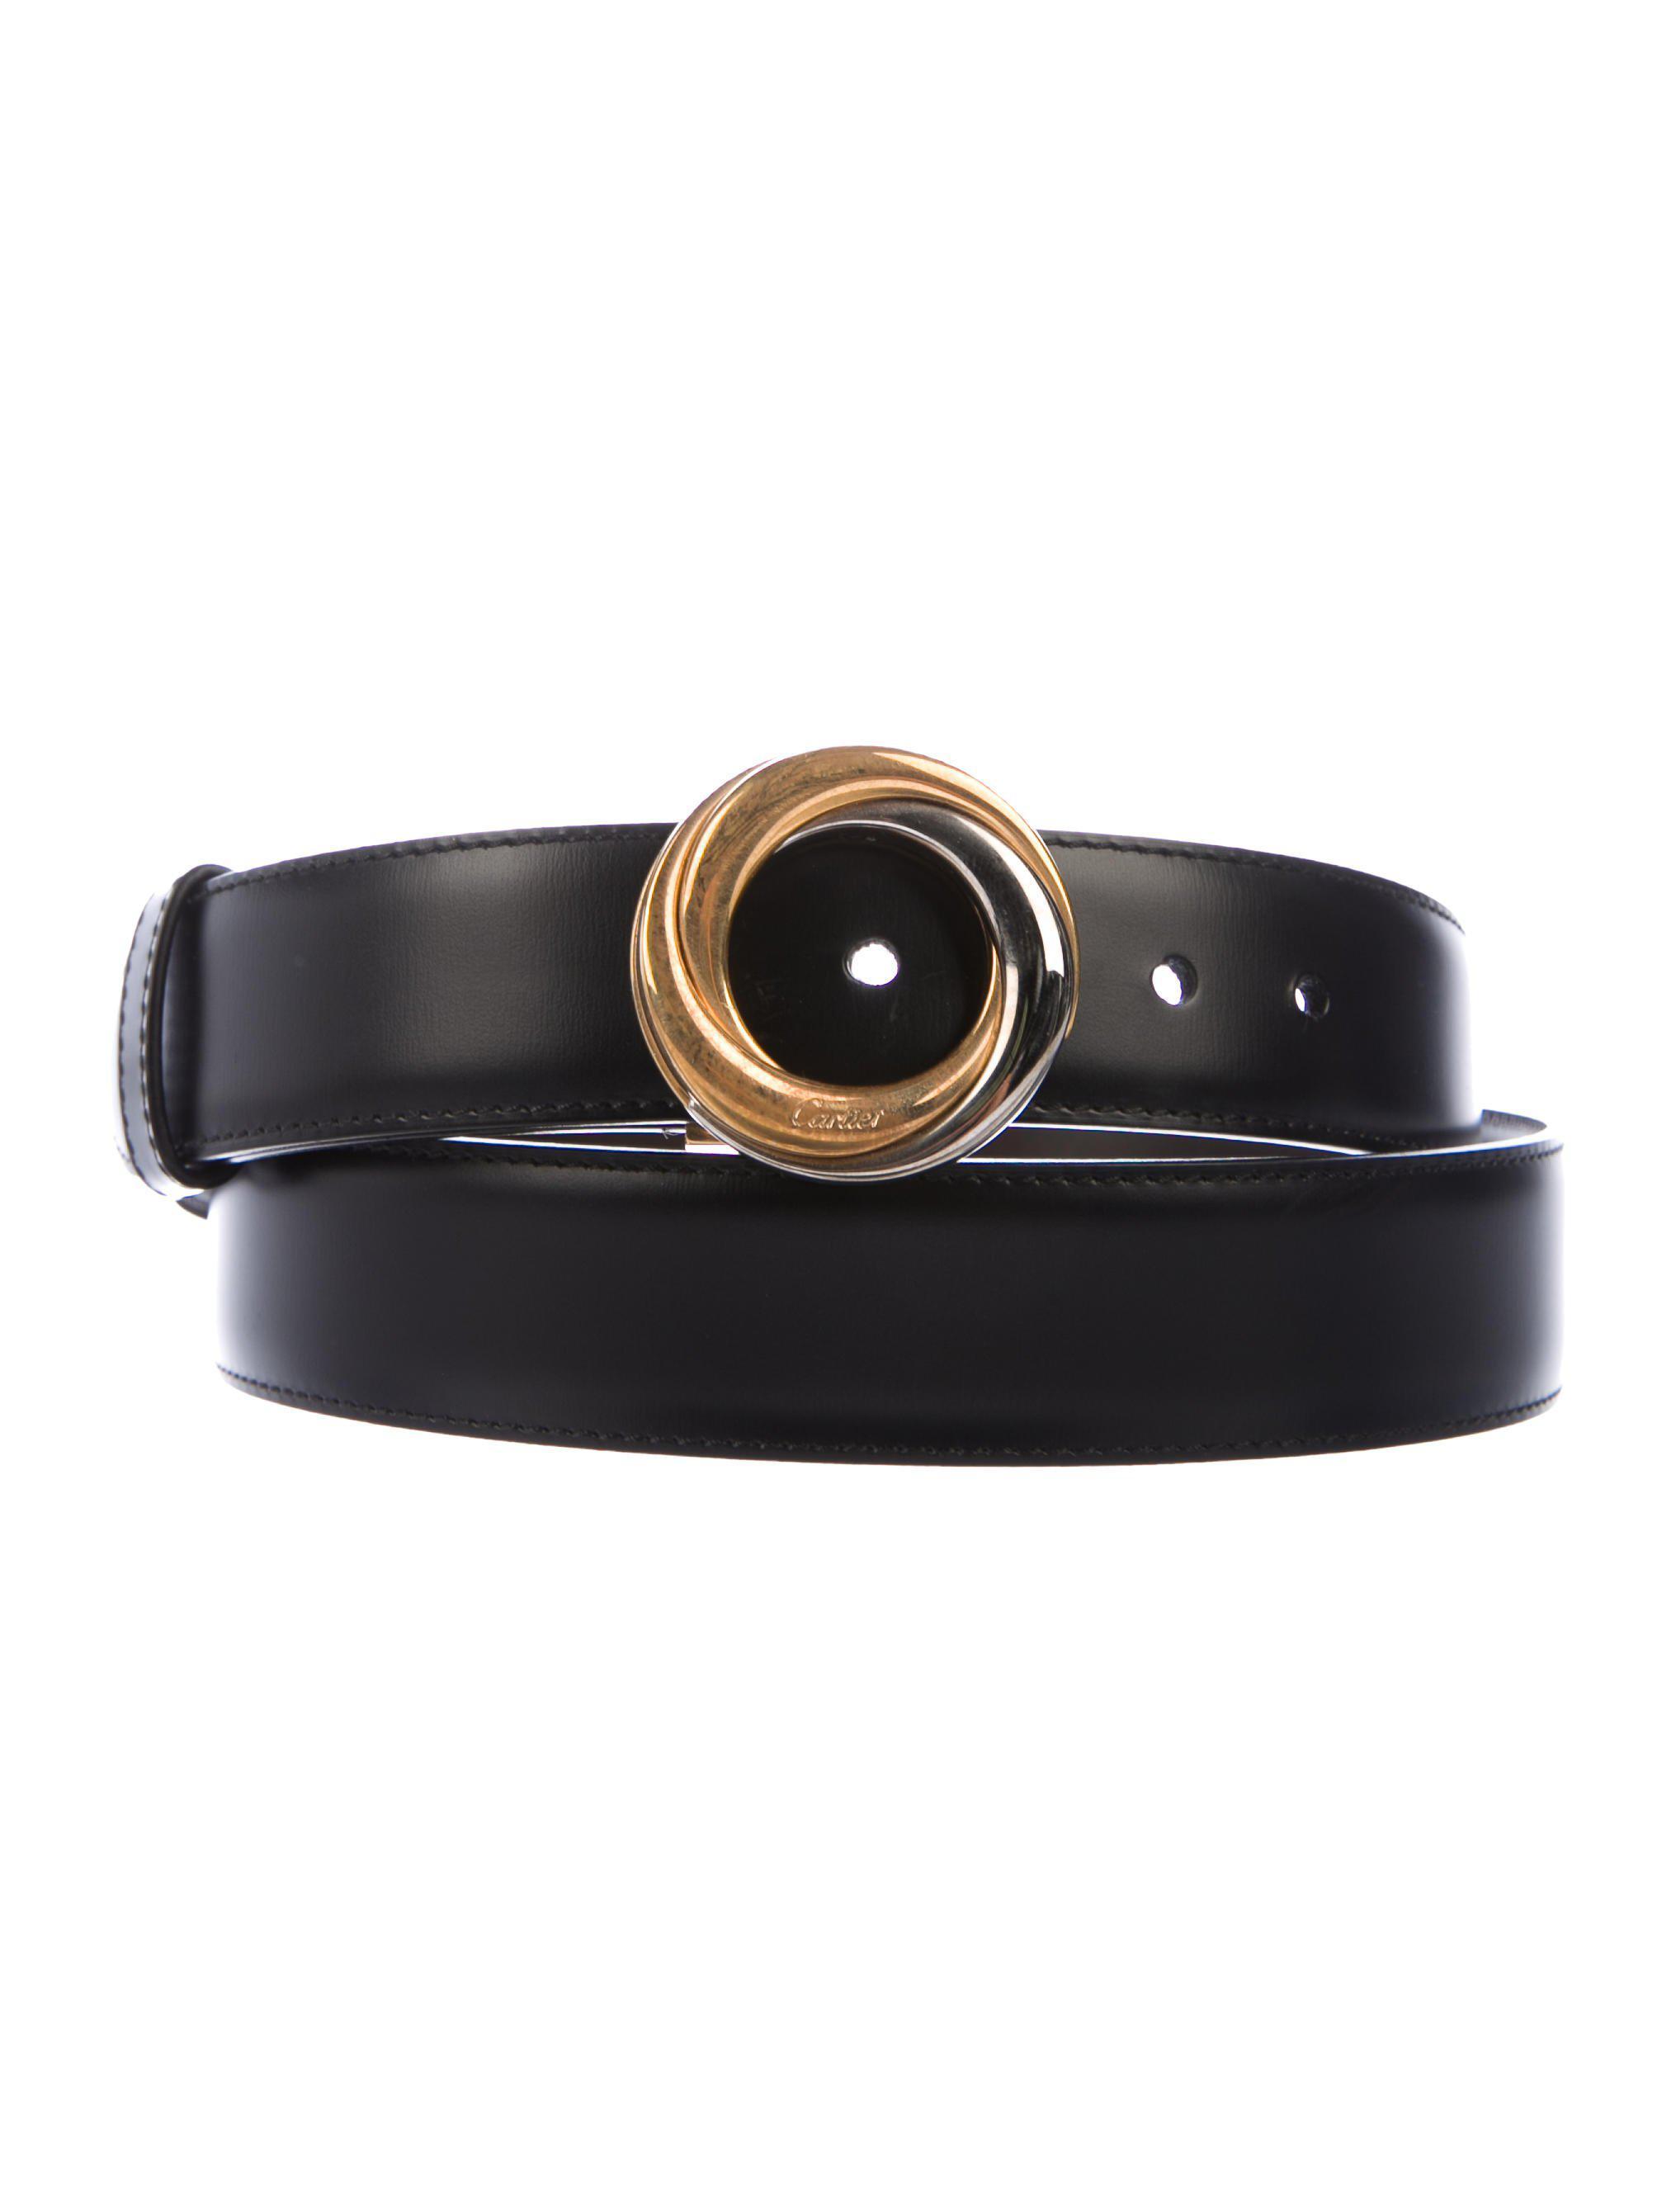 3254748317c3 Lyst - Cartier Trinity Reversible Leather Belt Black in Metallic for Men